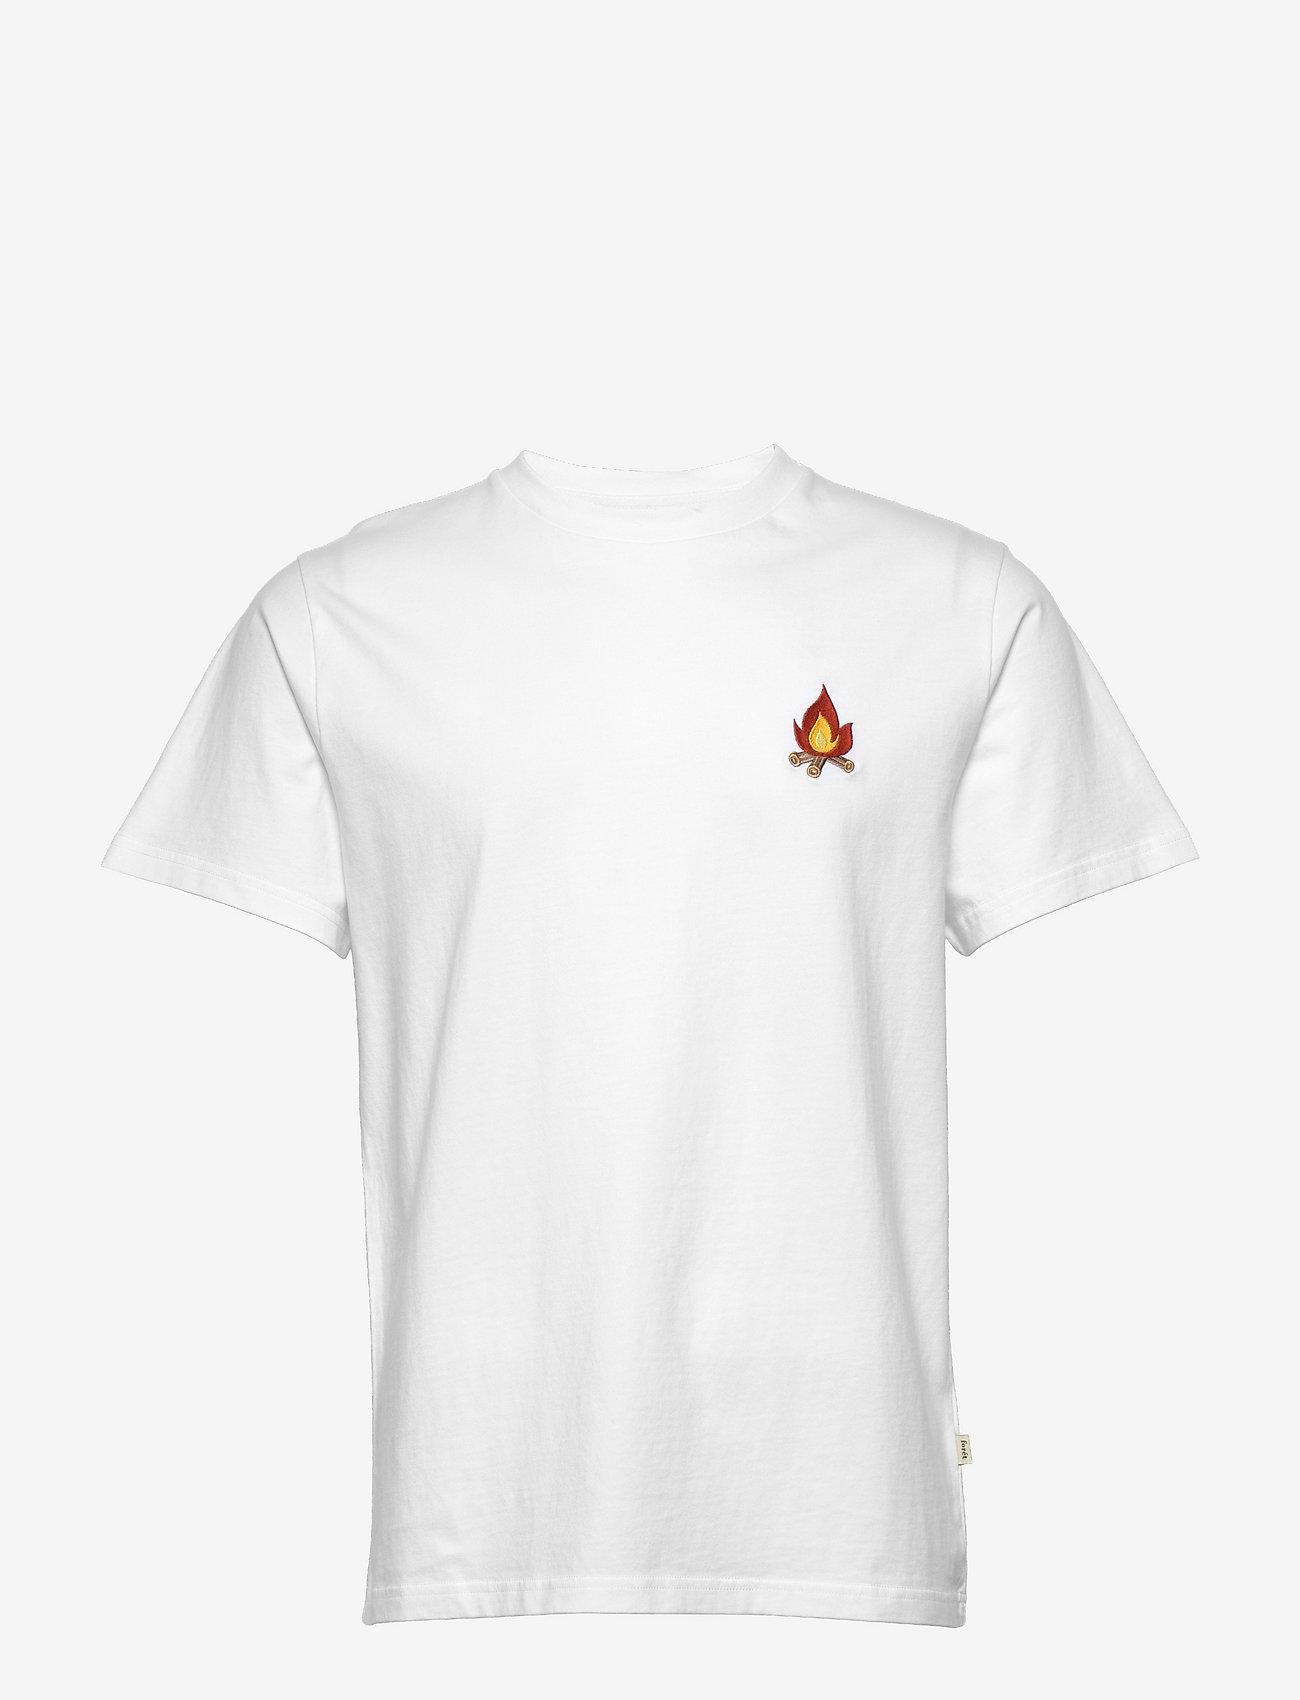 Forét - GLOW T-SHIRT - basic t-shirts - white - 0